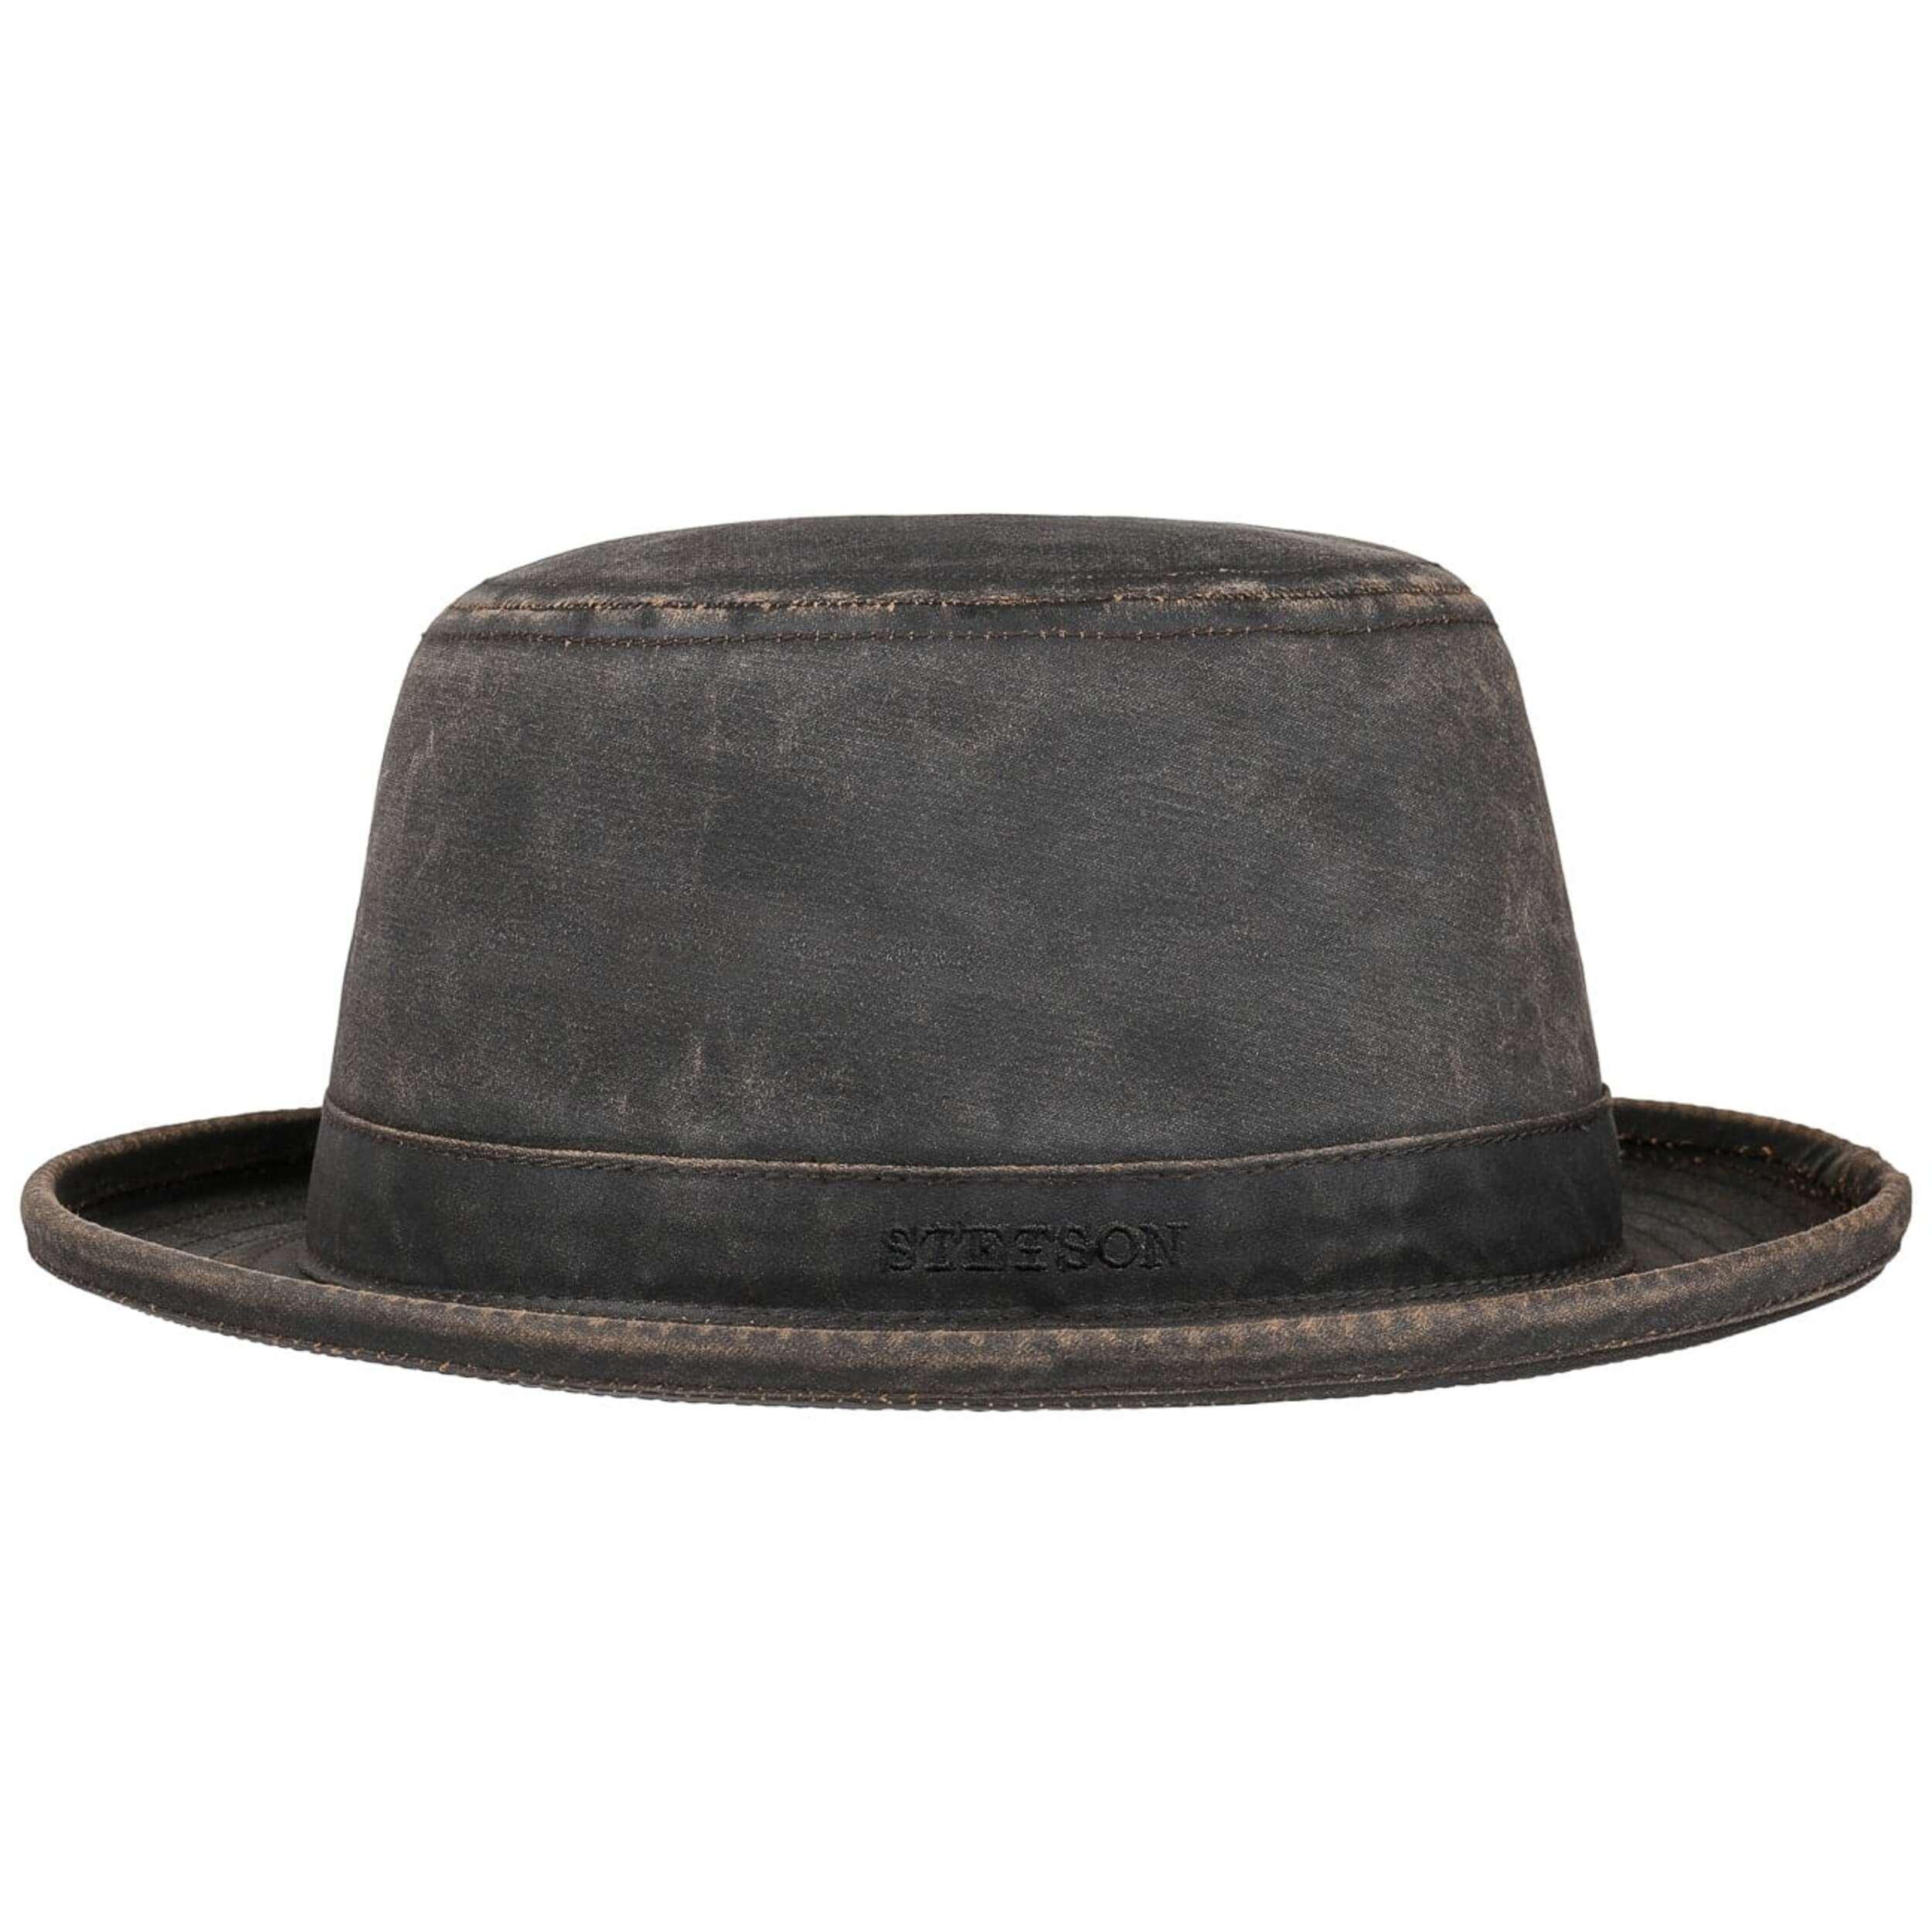 sombrero top hat pork pie by stetson sombreros. Black Bedroom Furniture Sets. Home Design Ideas